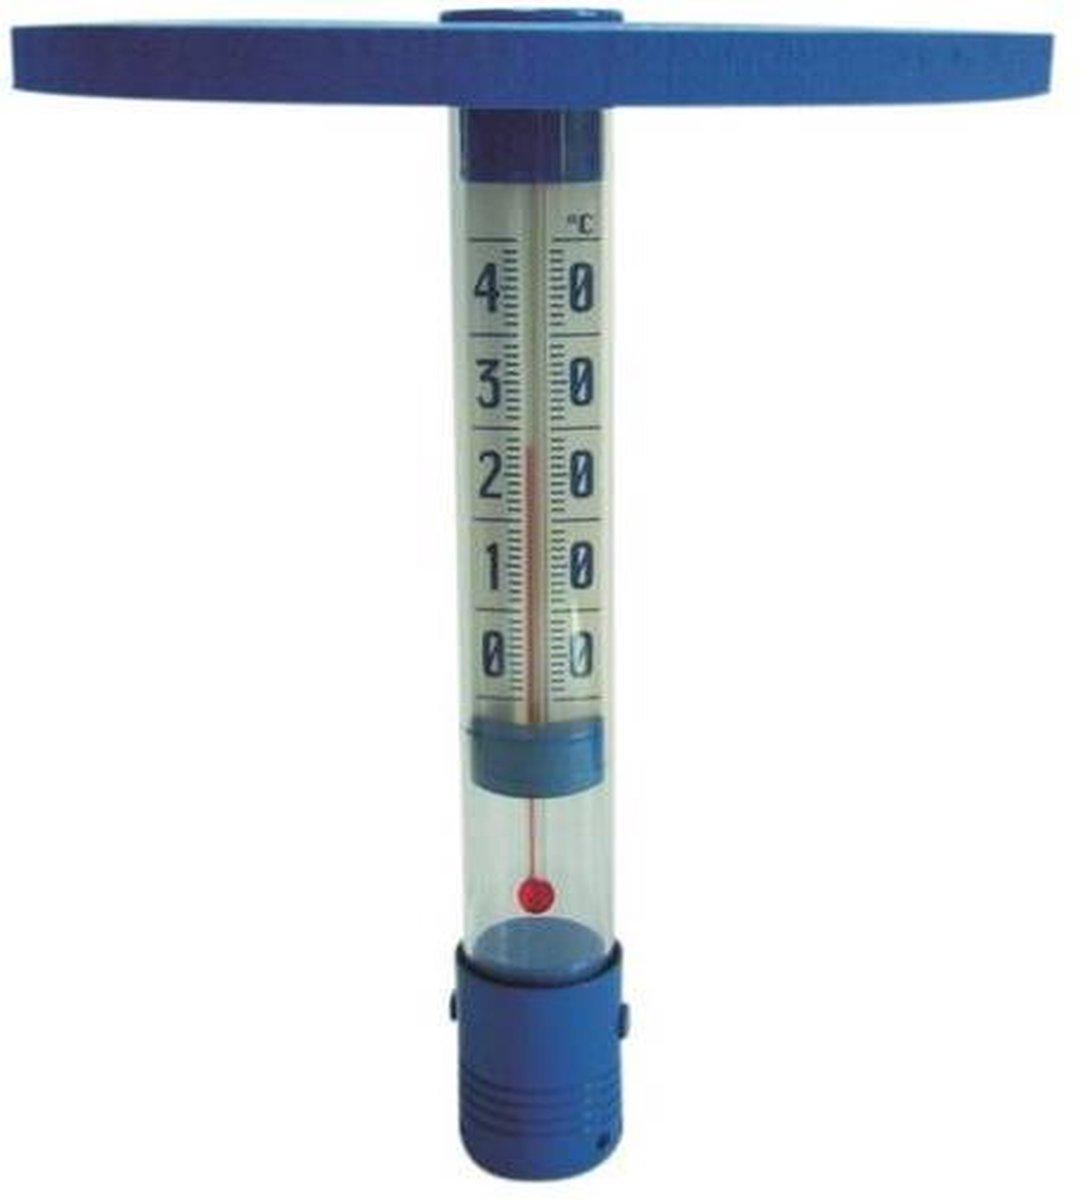 Kerlis Duo Thermometer